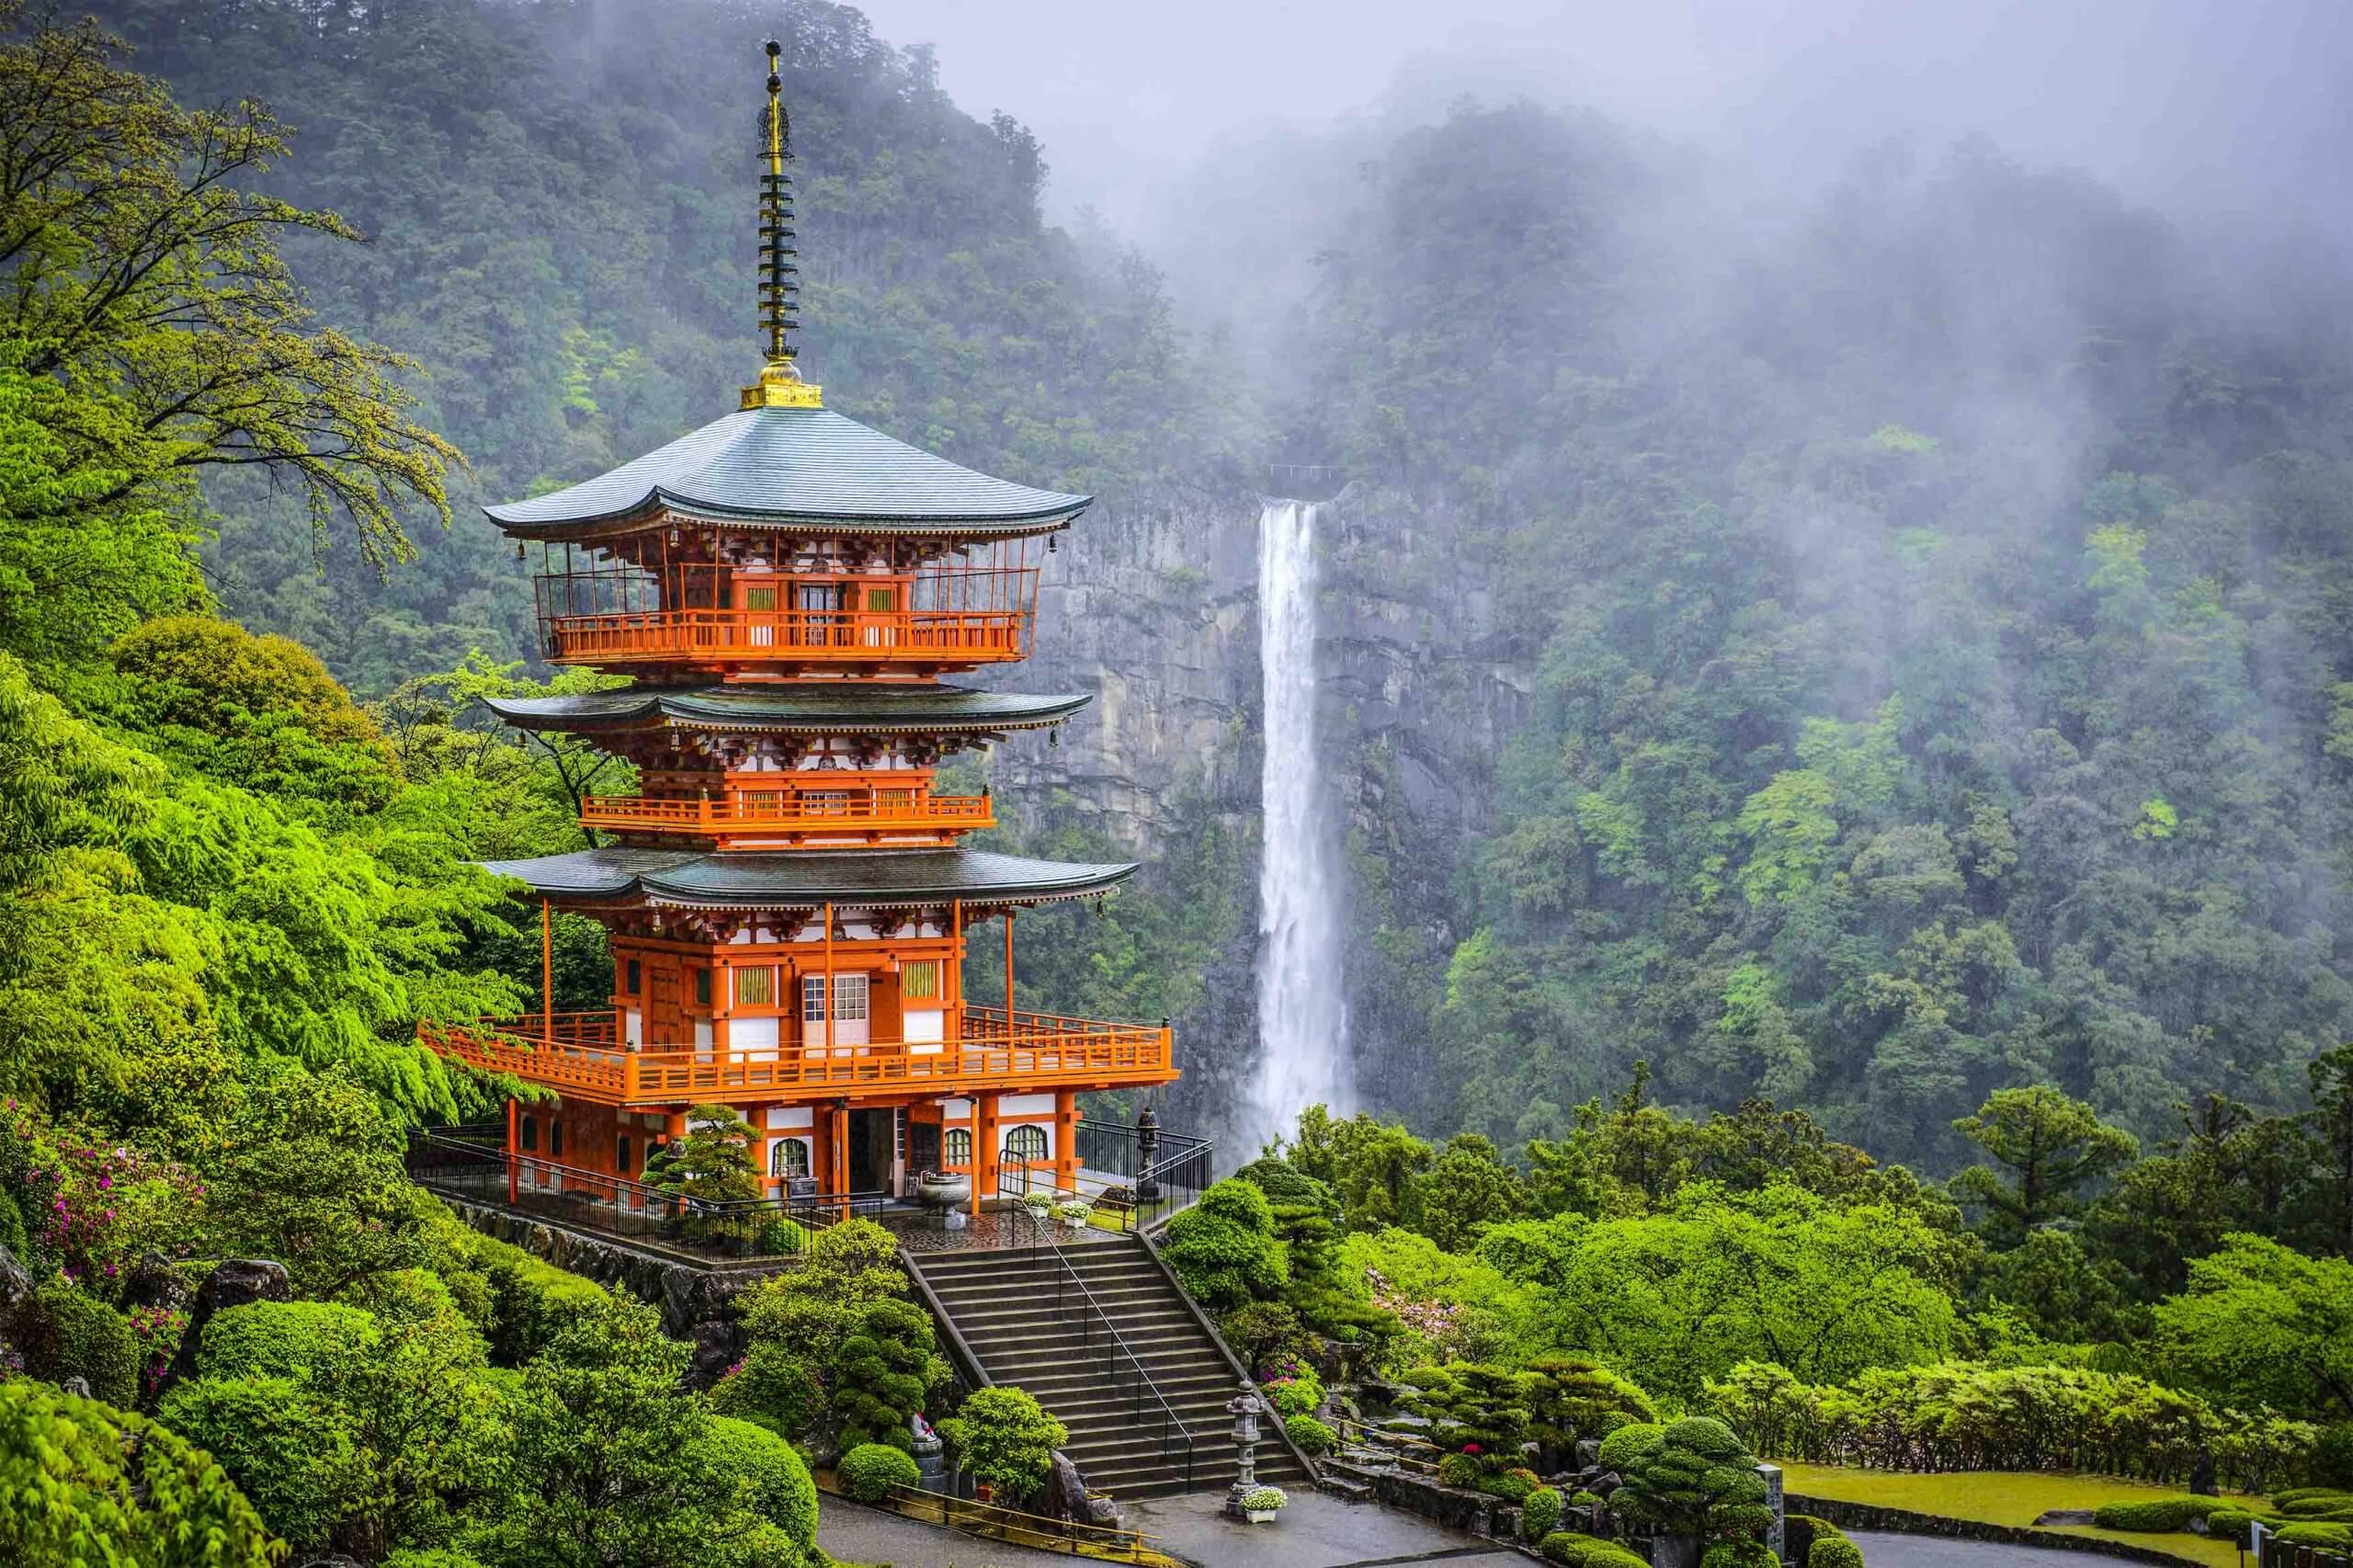 Reiseziel Japan ©Sean Pavone-shutterstock.com